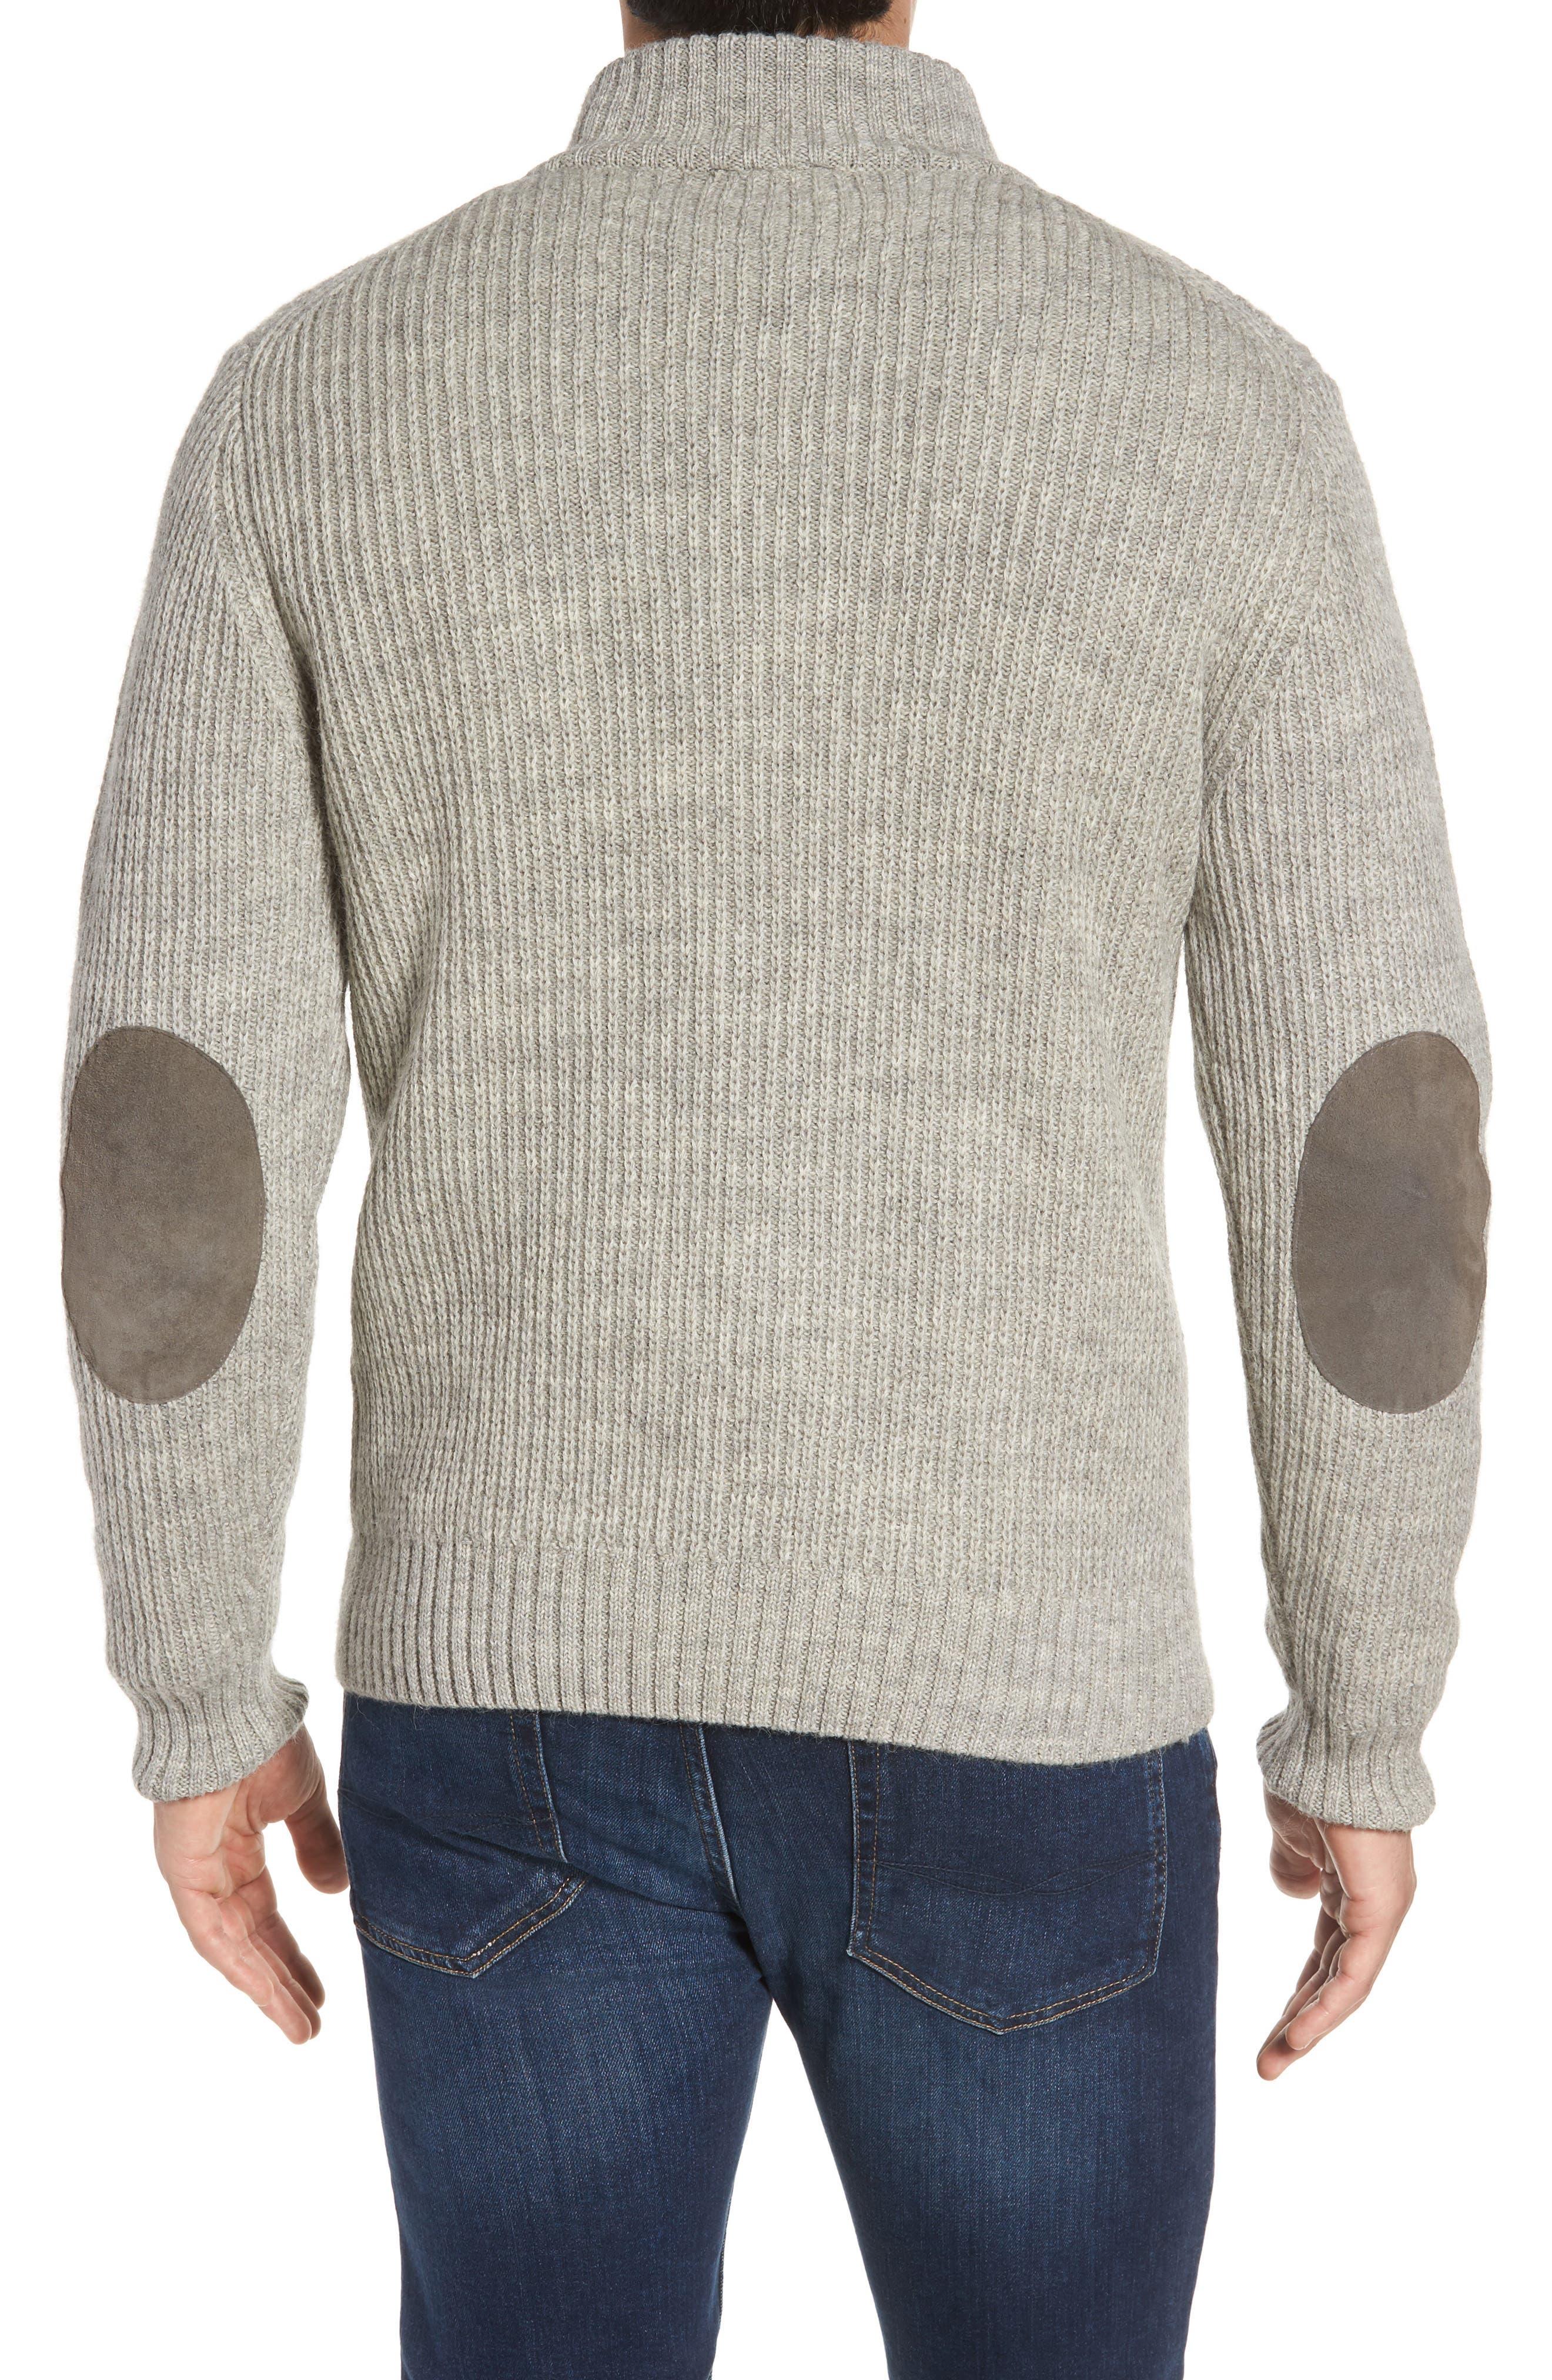 'Huka Lodge' Merino Wool Blend Quarter Zip Sweater,                             Alternate thumbnail 2, color,                             268